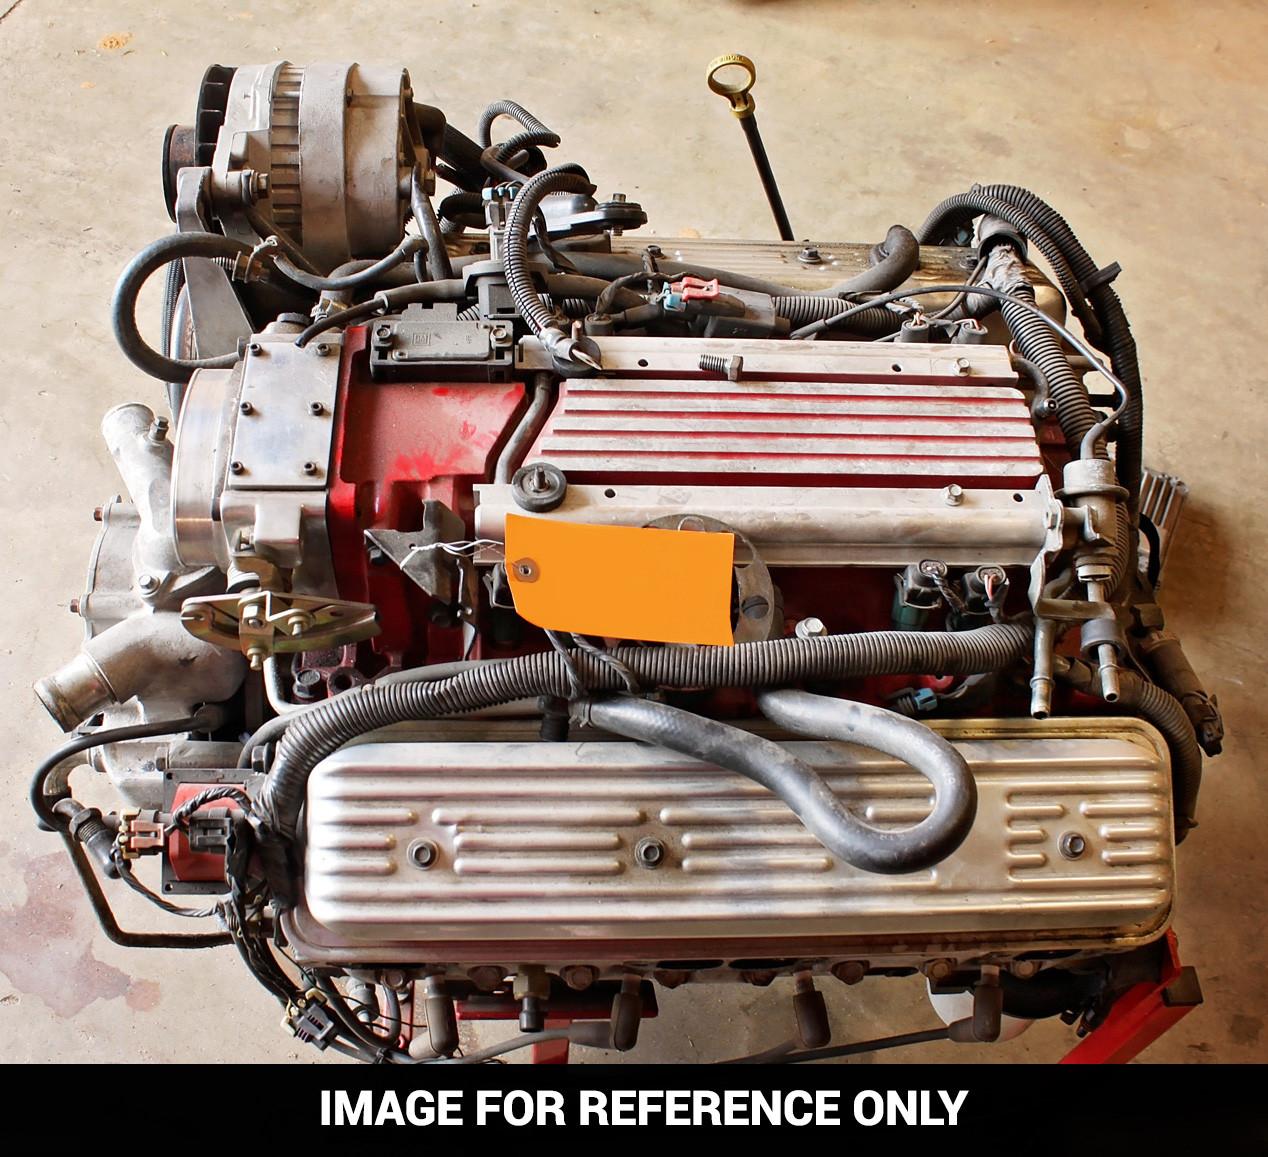 97 Lt1 Wiring Diagram Explained Diagrams Plug 93 Engine Residential Electrical Symbols U2022 Fan Pinout